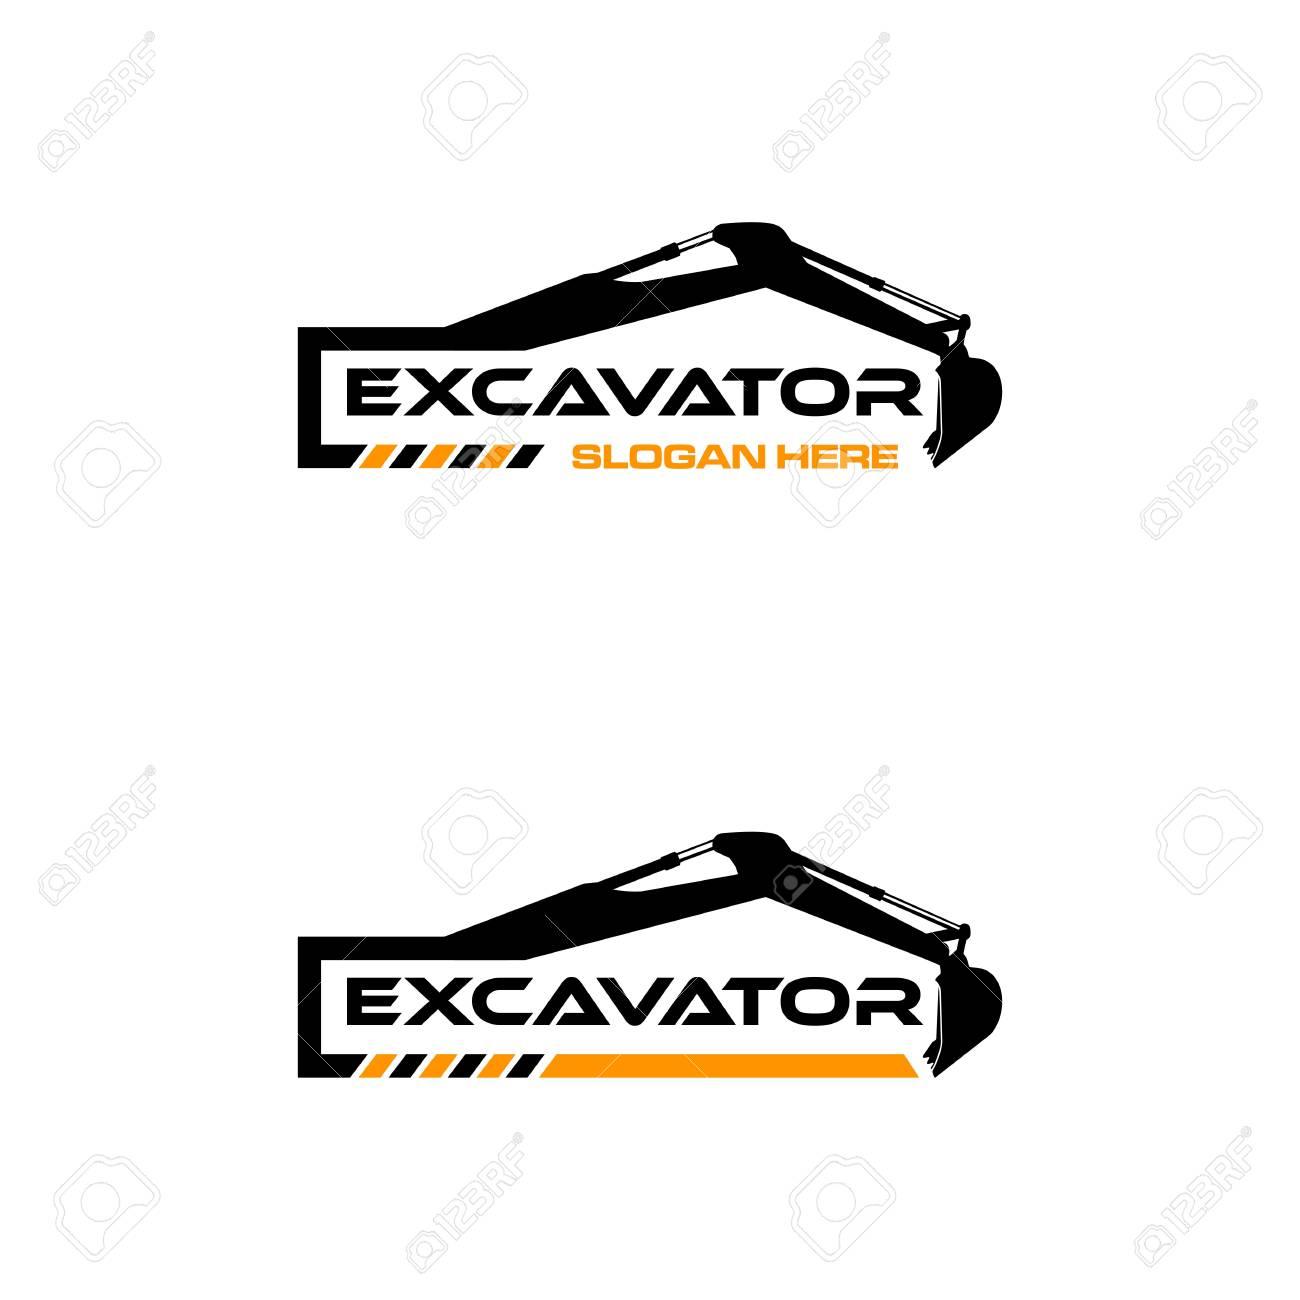 Excavator Vector icon Template. construction, vector illustration - 97840740